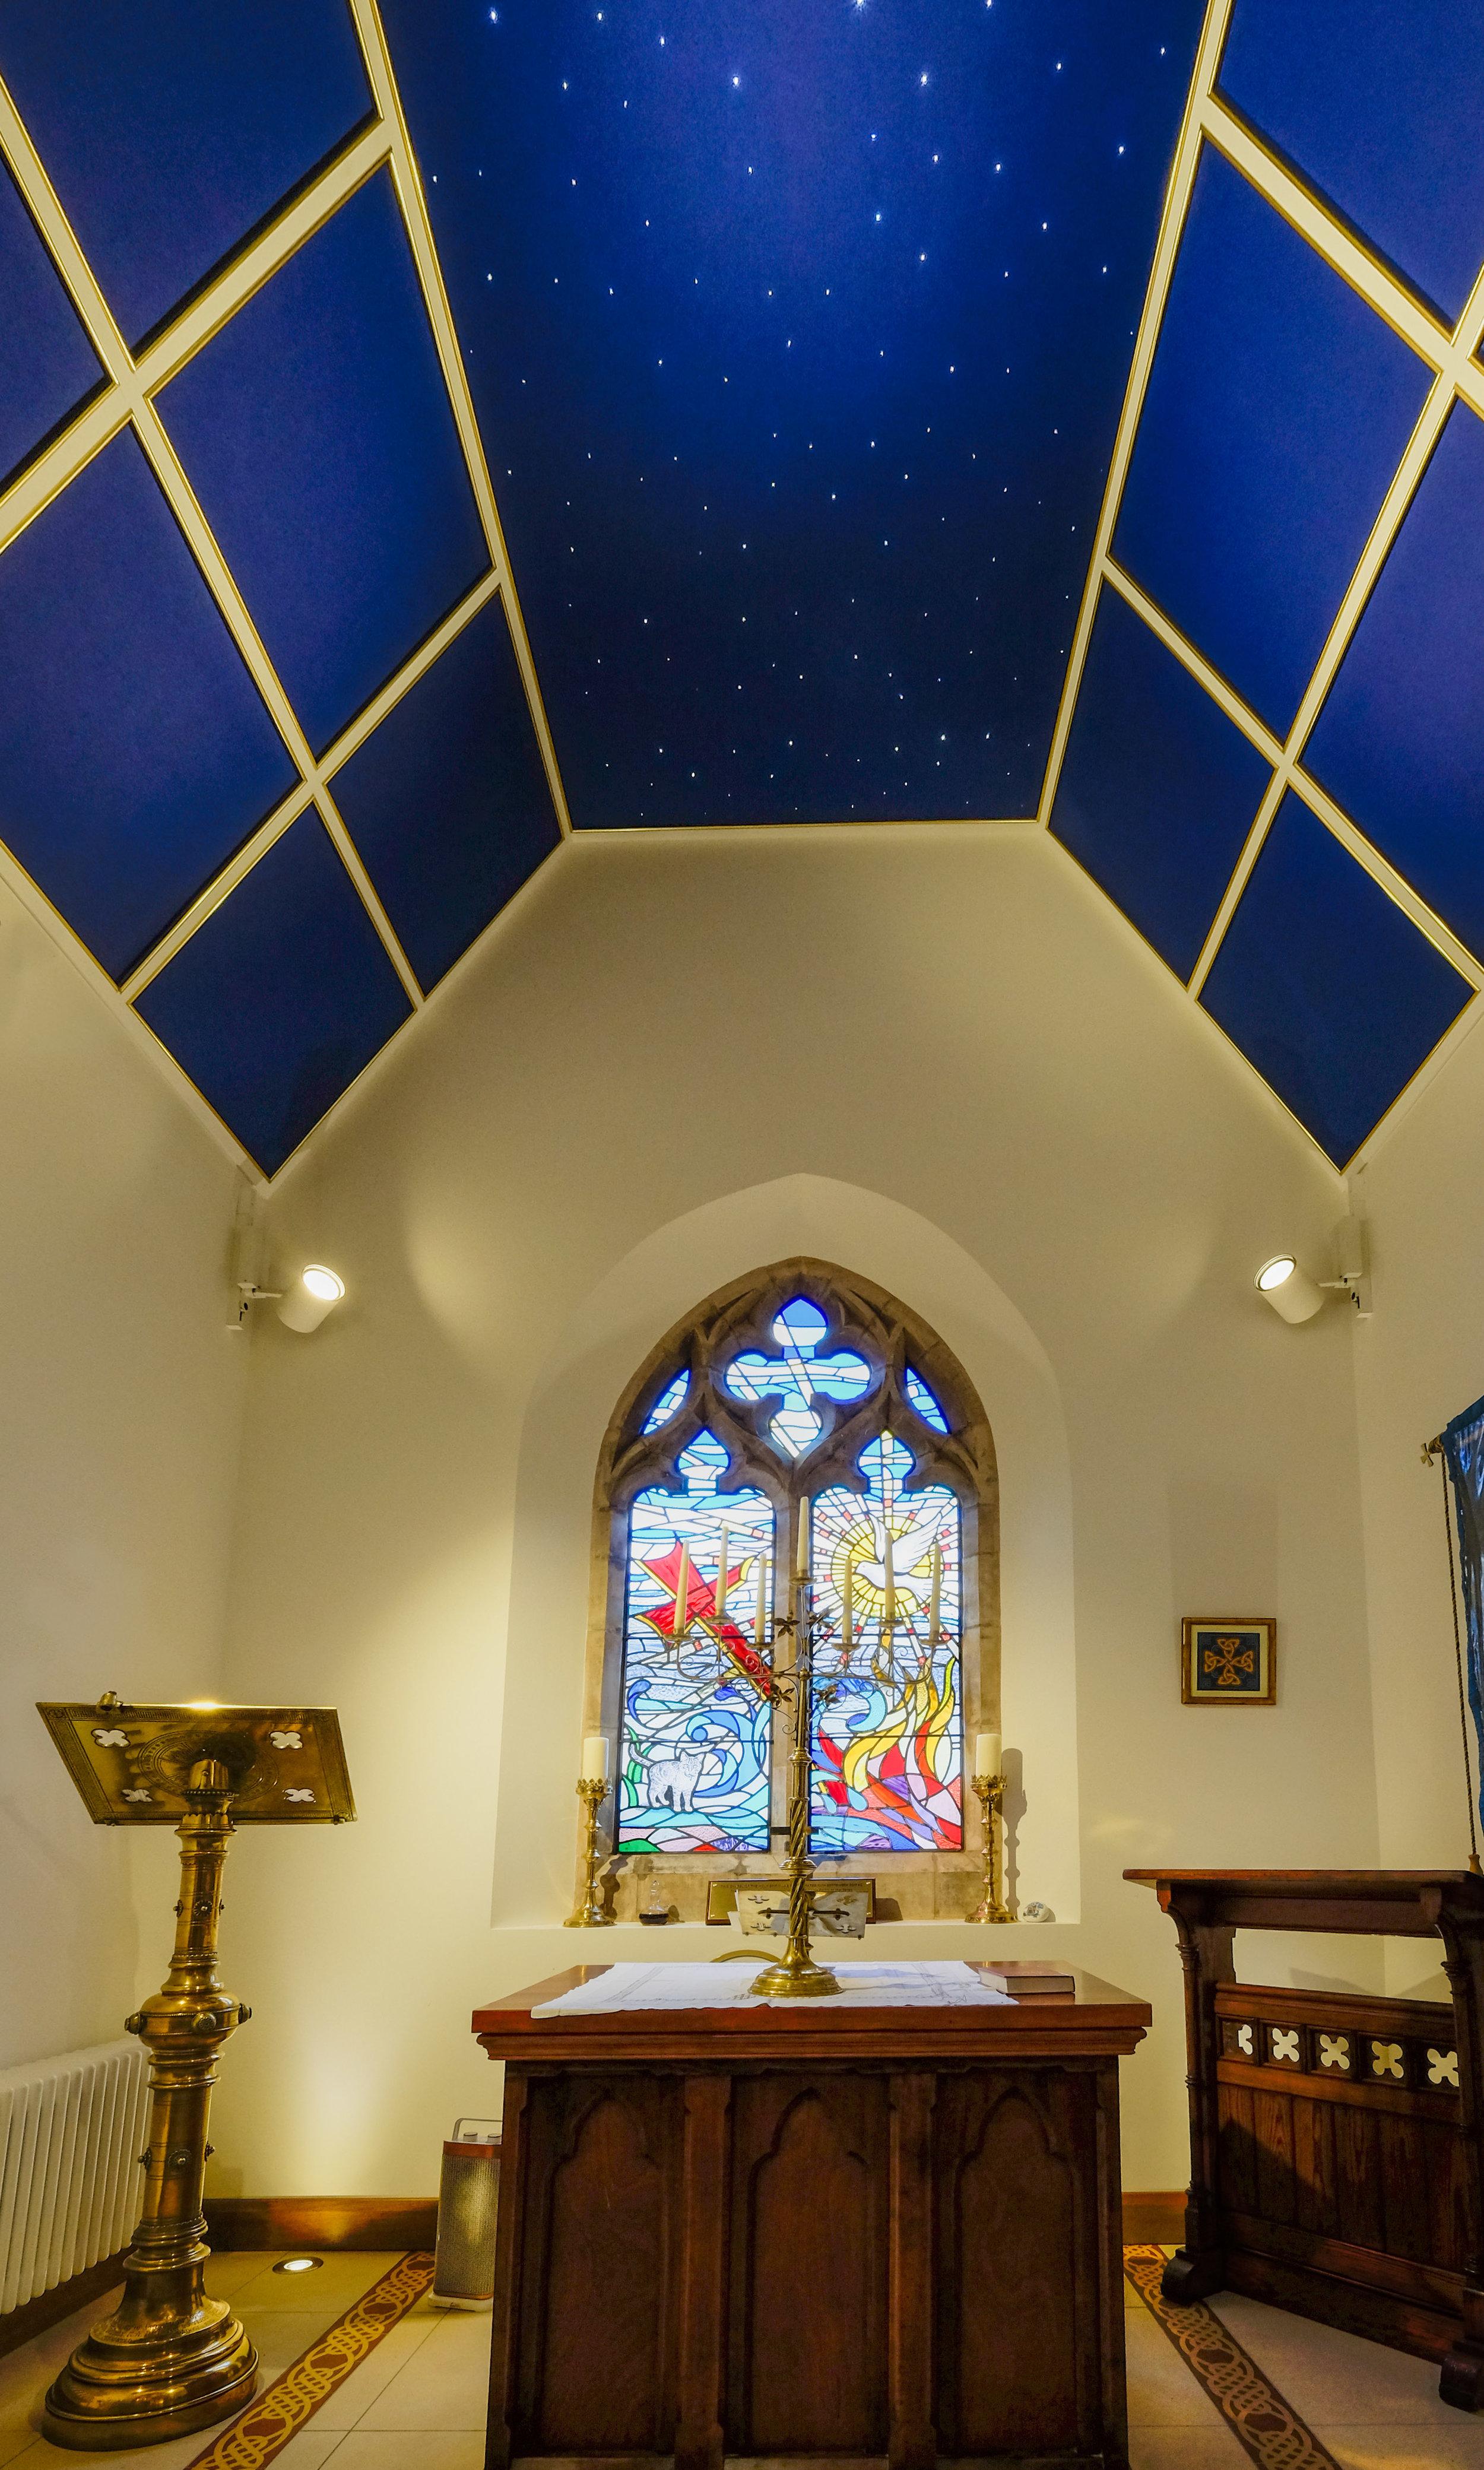 St. Colman's Church Dunmurry